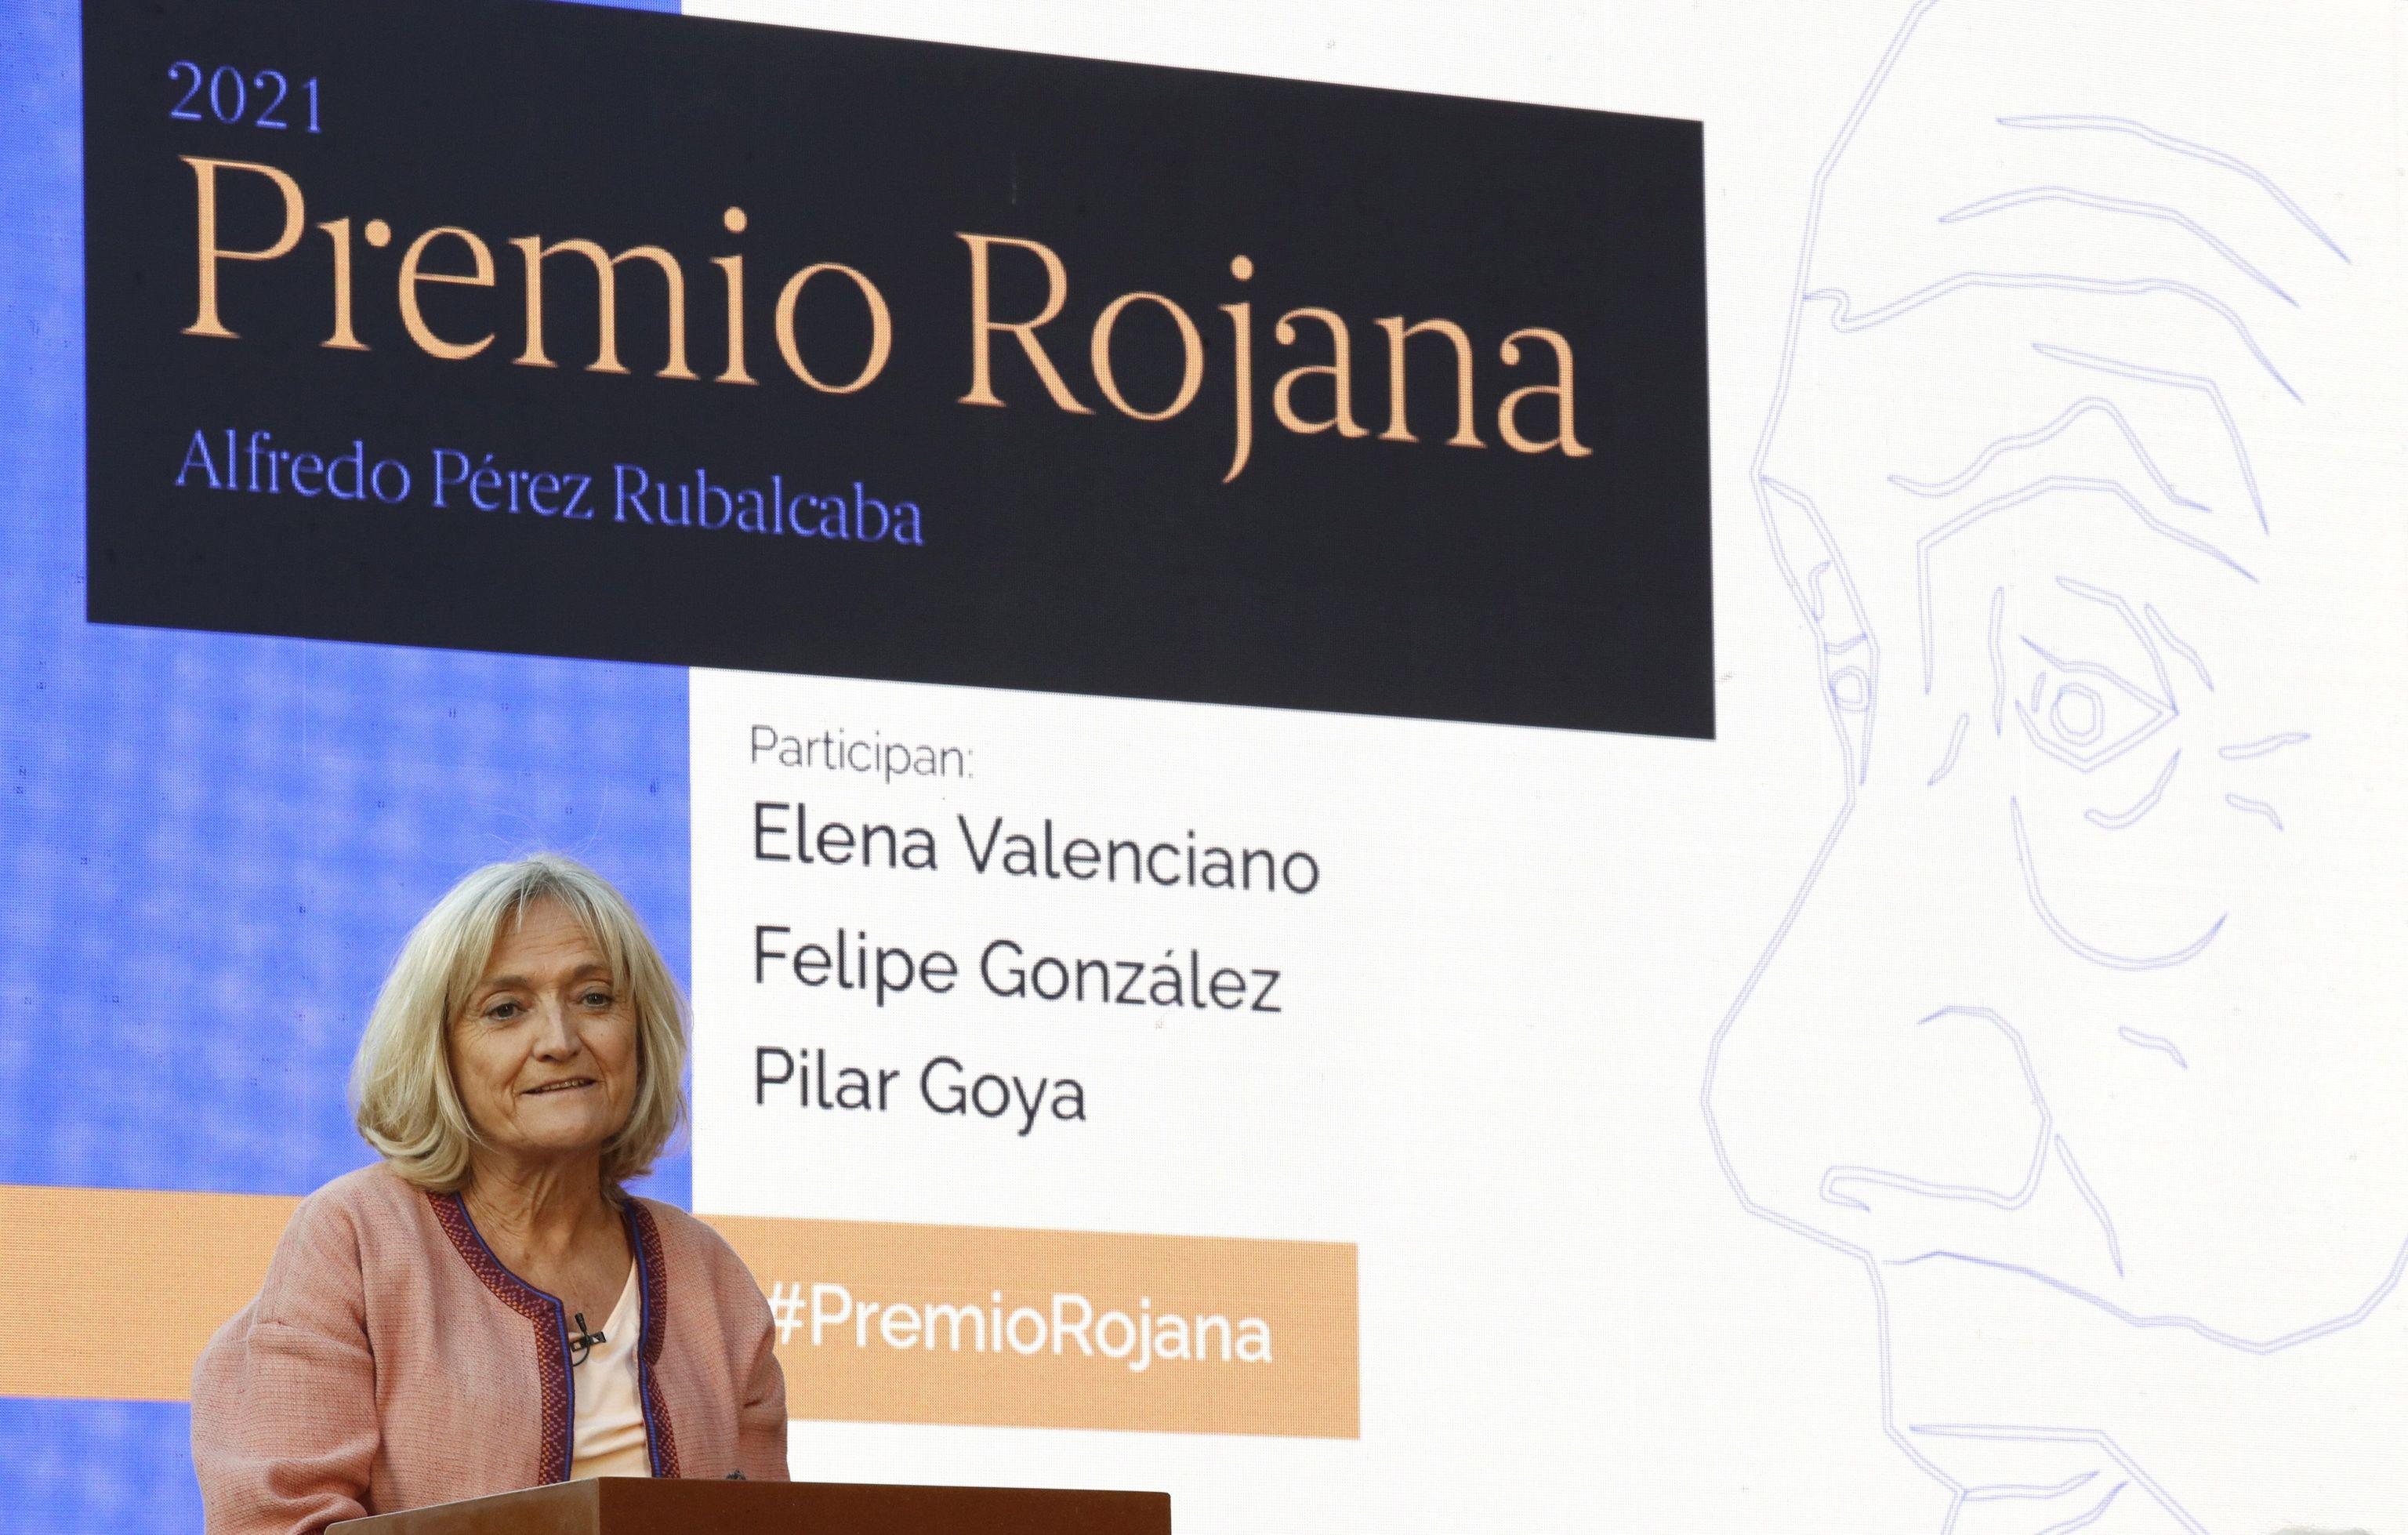 Pilar Goya, viuda de Alfredo Pérez Rubalcaba, interviene en el acto.